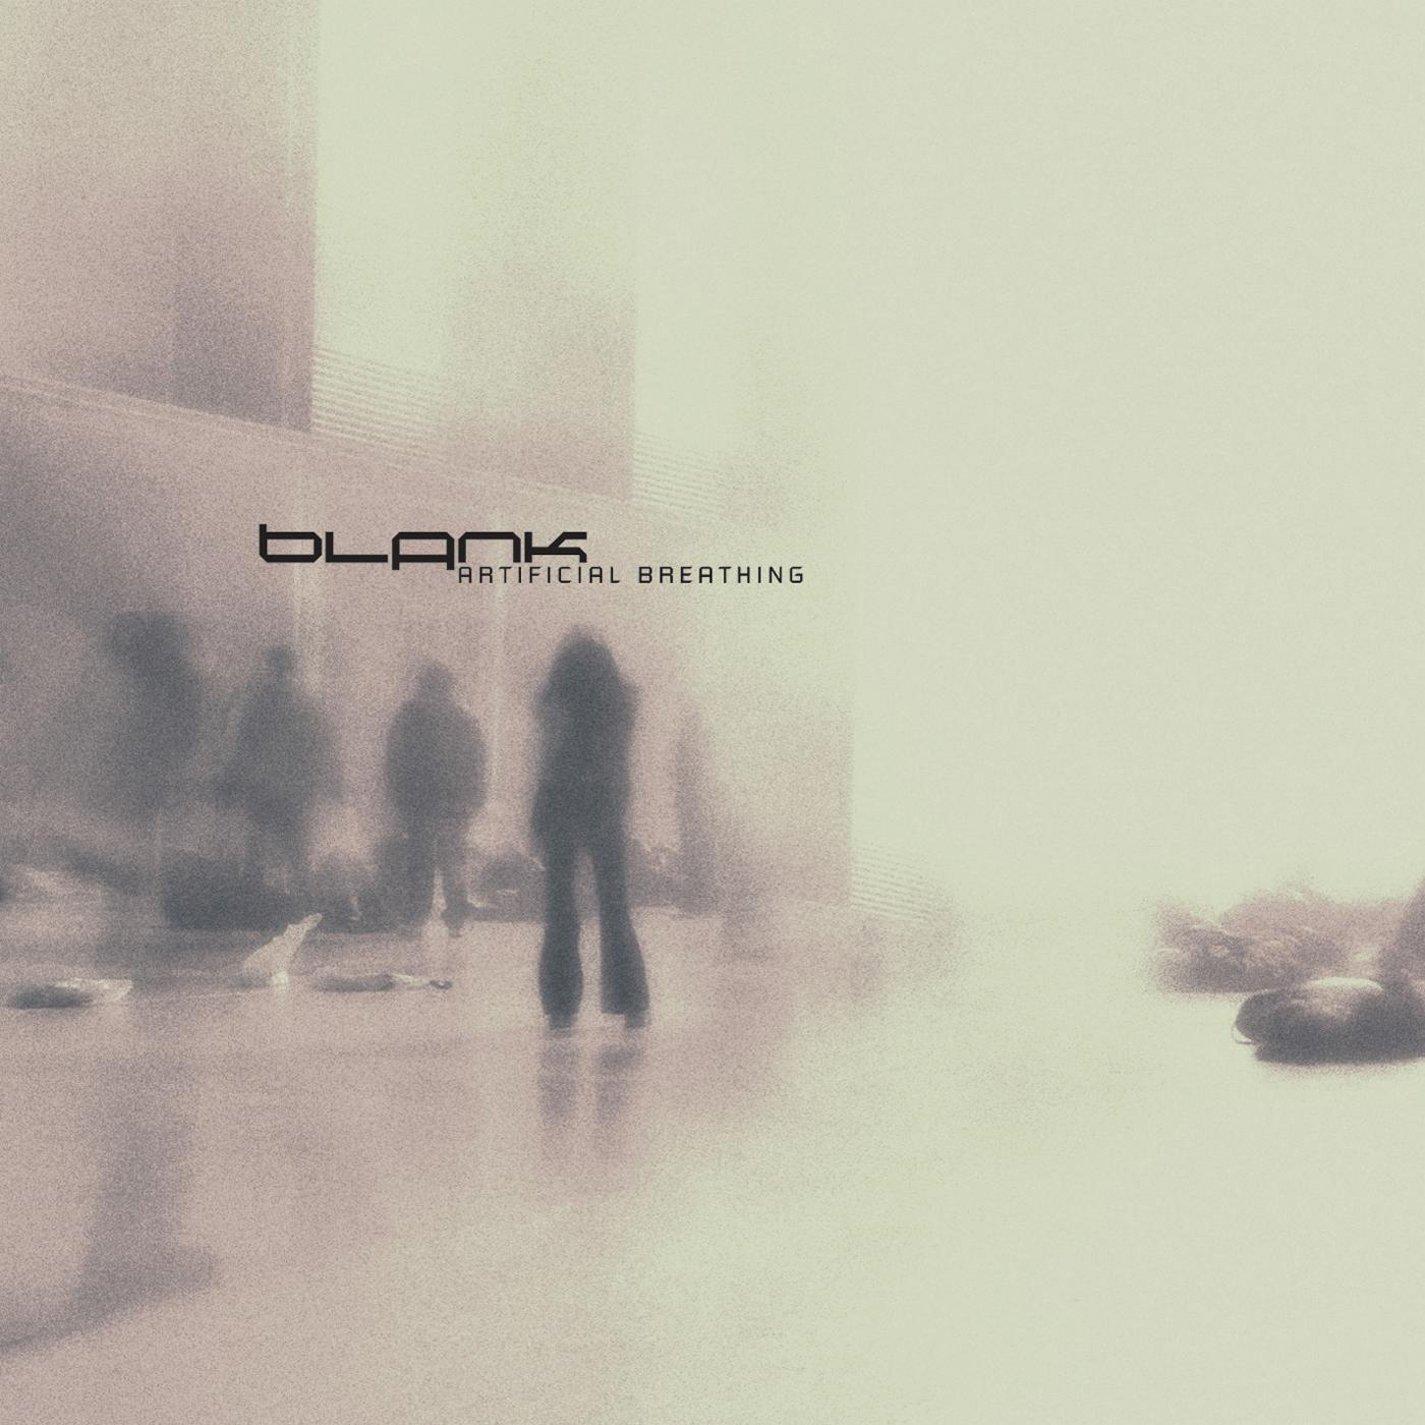 CD : Blank - Artificial Breathing (CD)